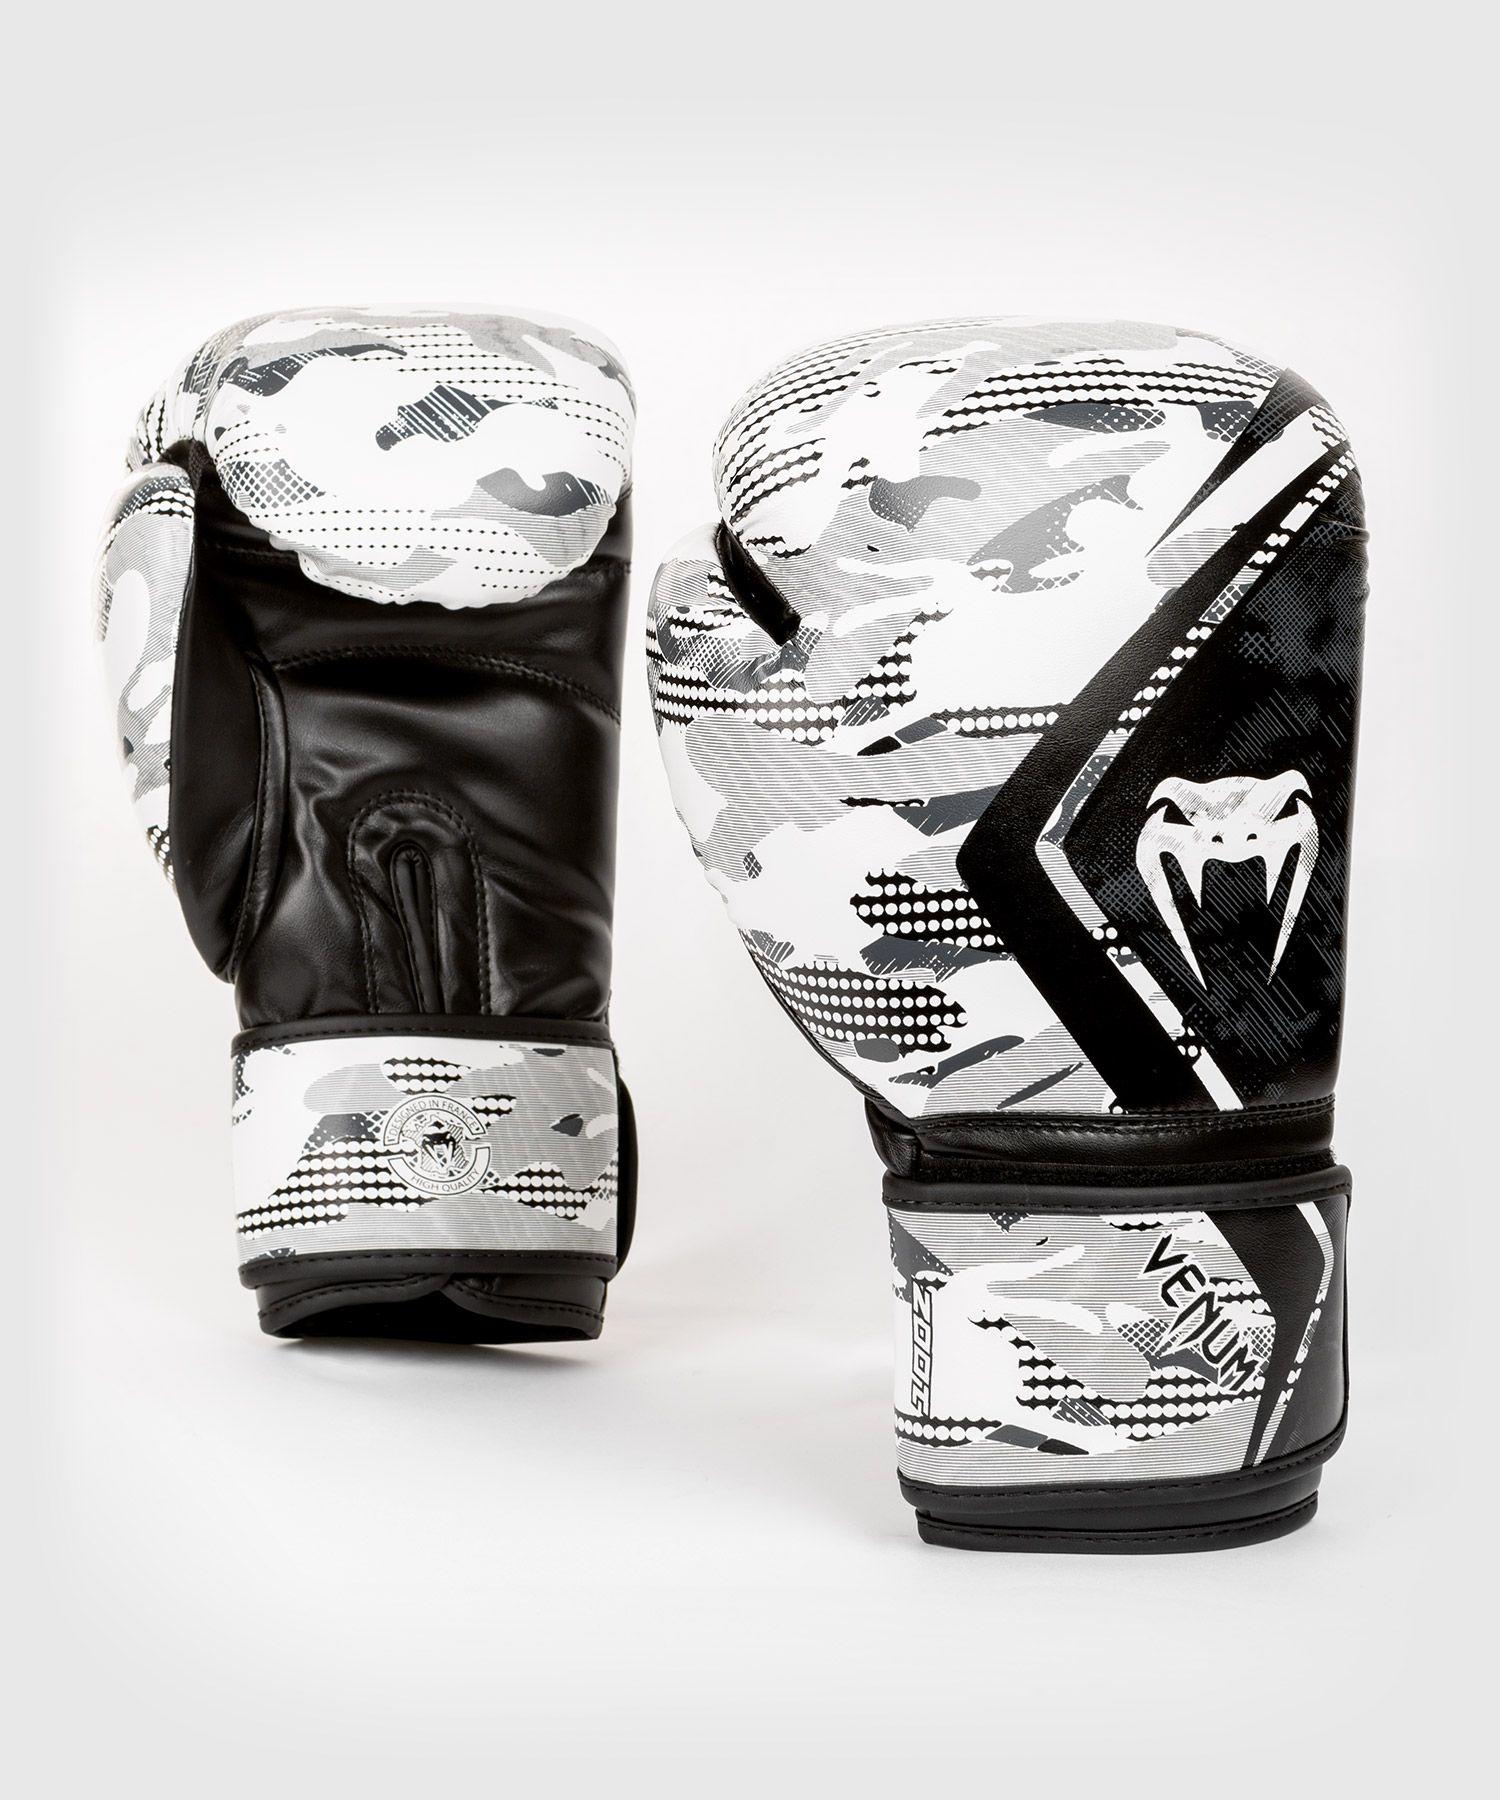 Venum Defender Contender 2.0 Boxing Gloves - Urban Camo